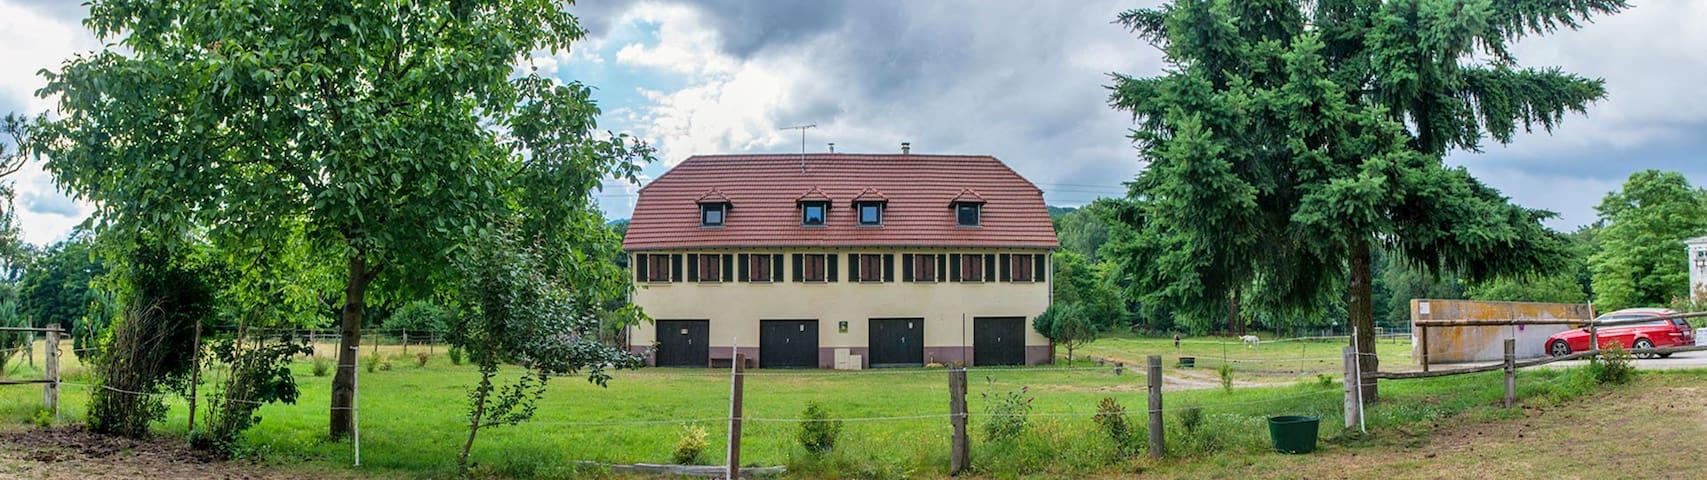 Crystal de La Forge - Wintzenheim - Apartament